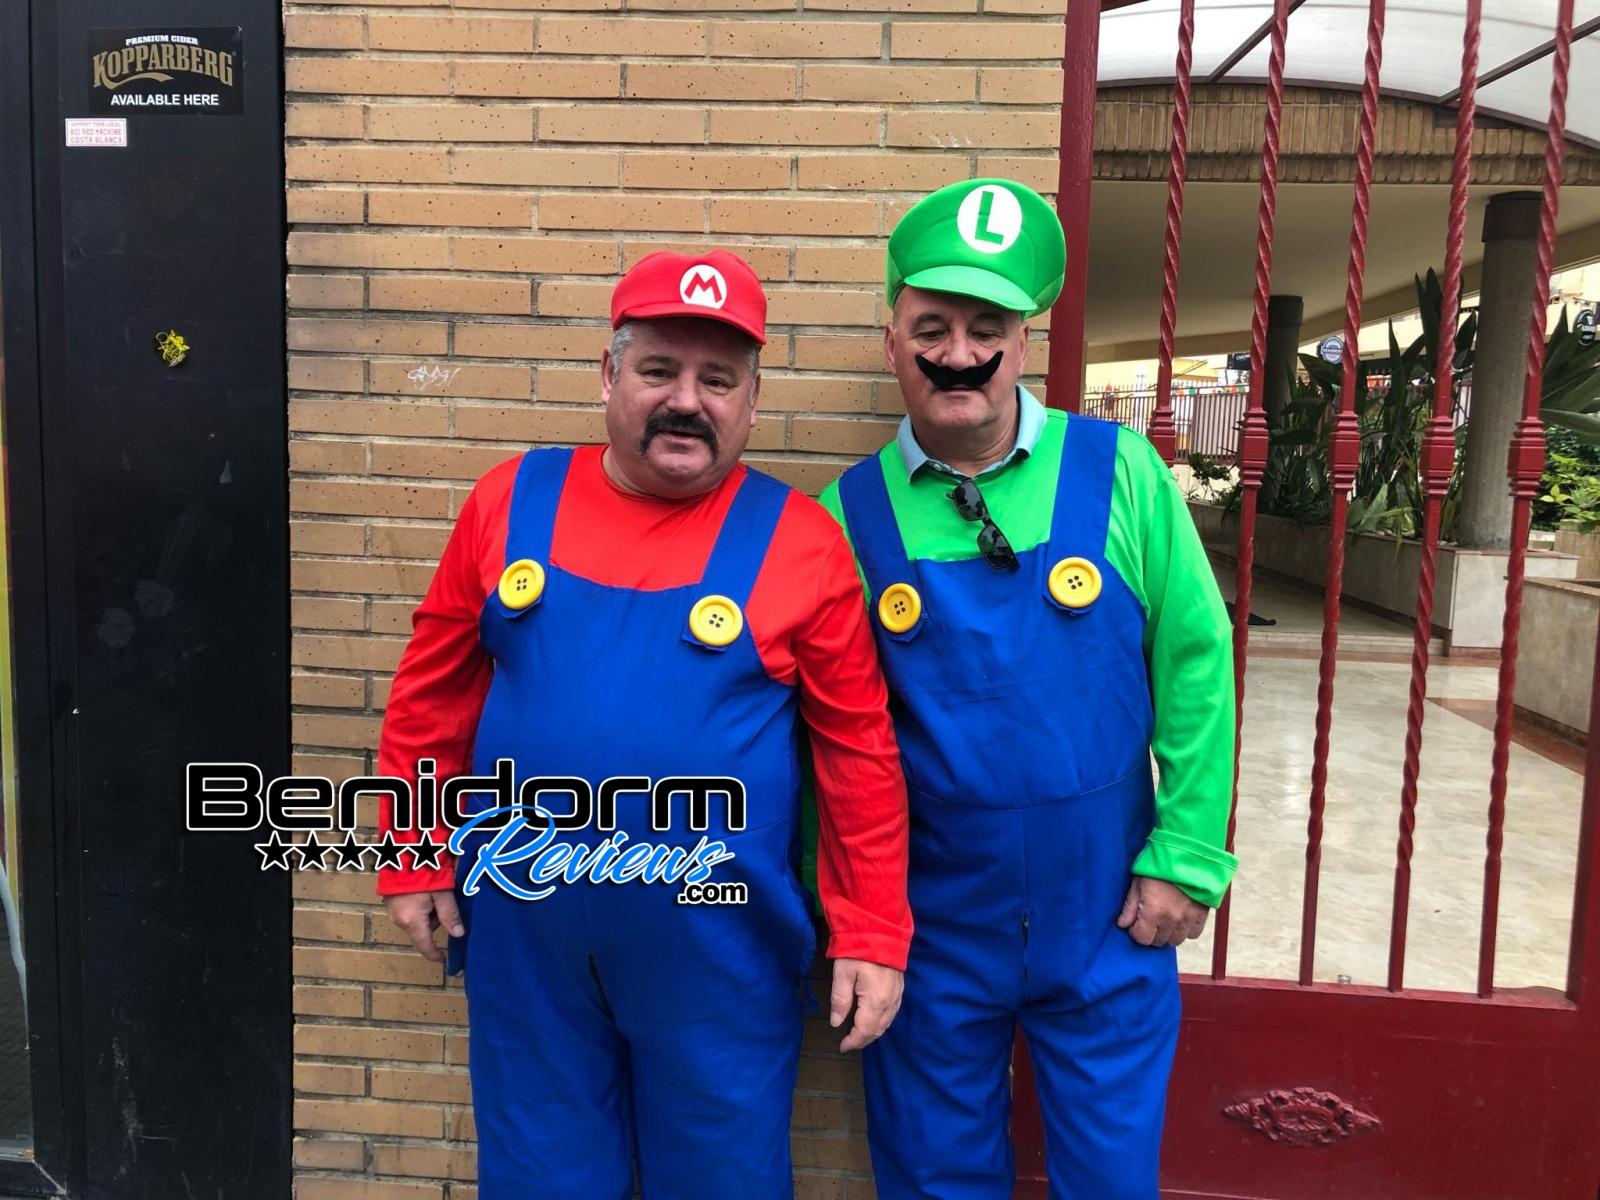 Benidorm-Fiestas-2019-Fancy-Dress-173